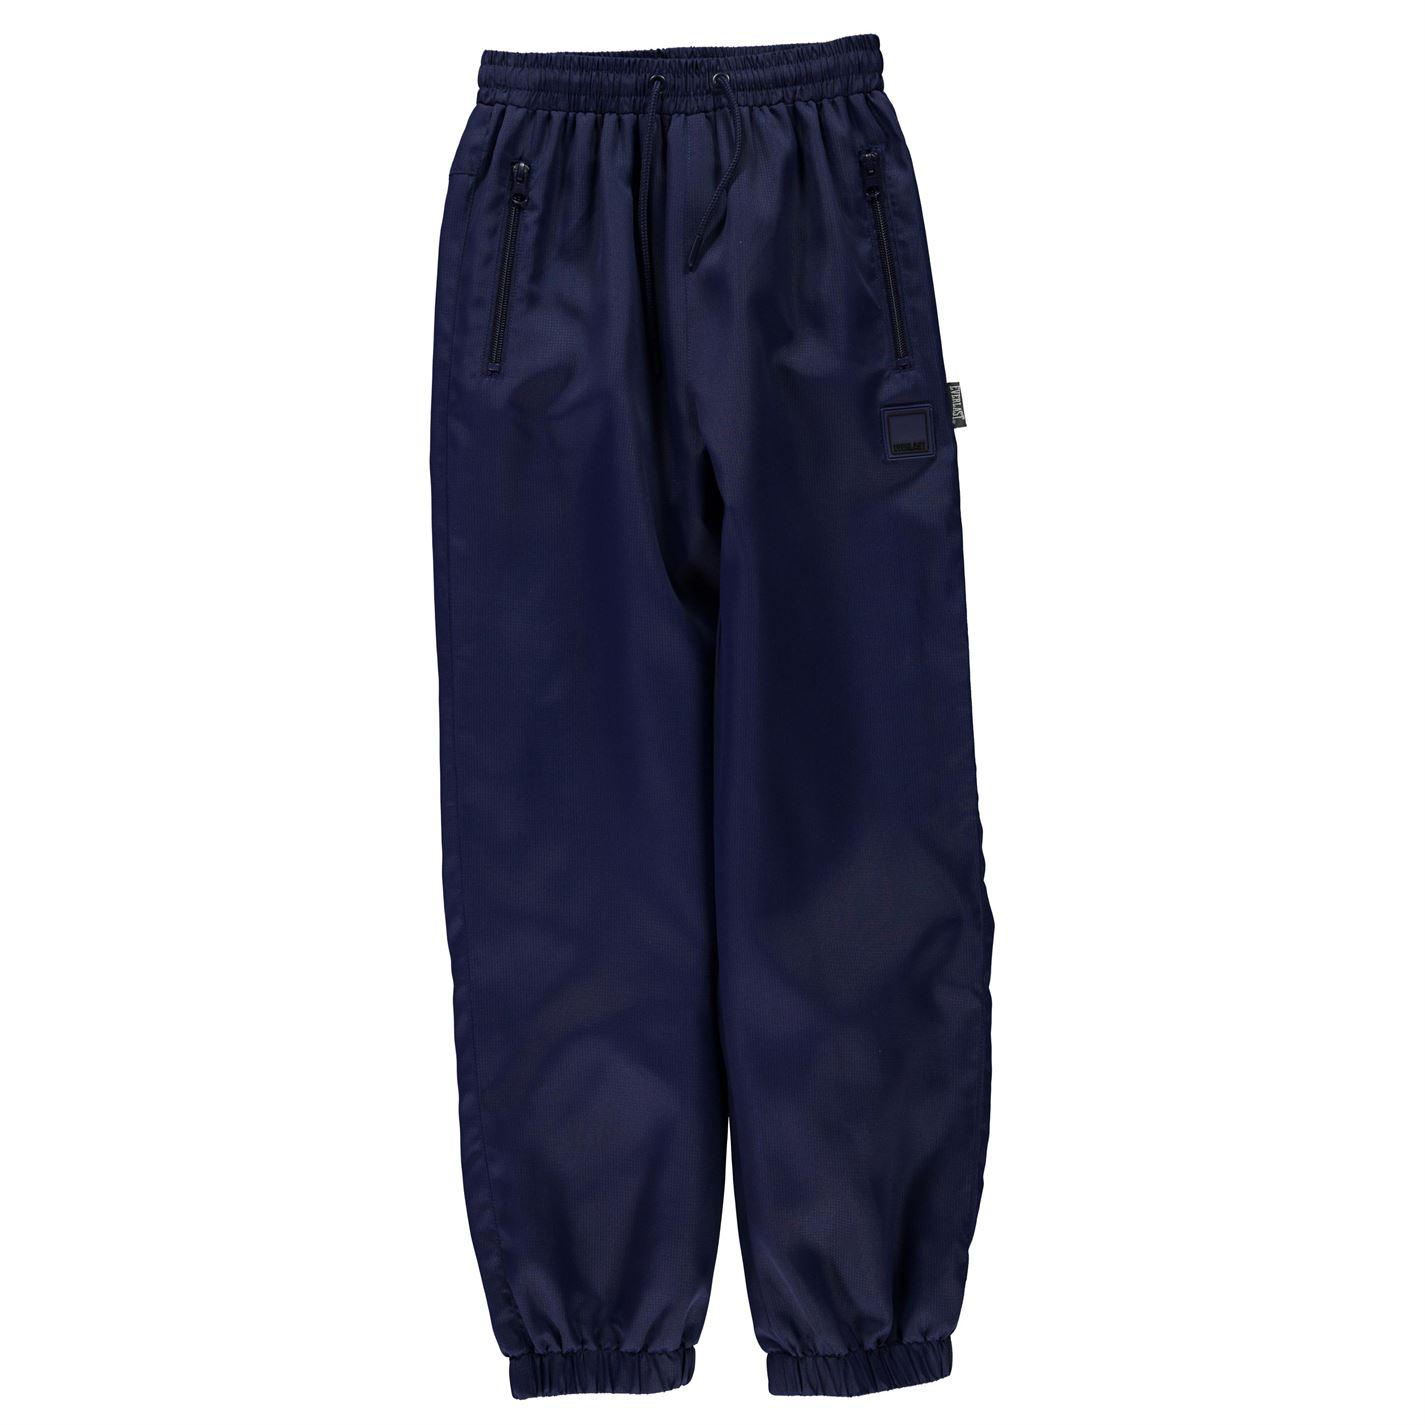 Everlast Woven Jogging Pants Junior Boys